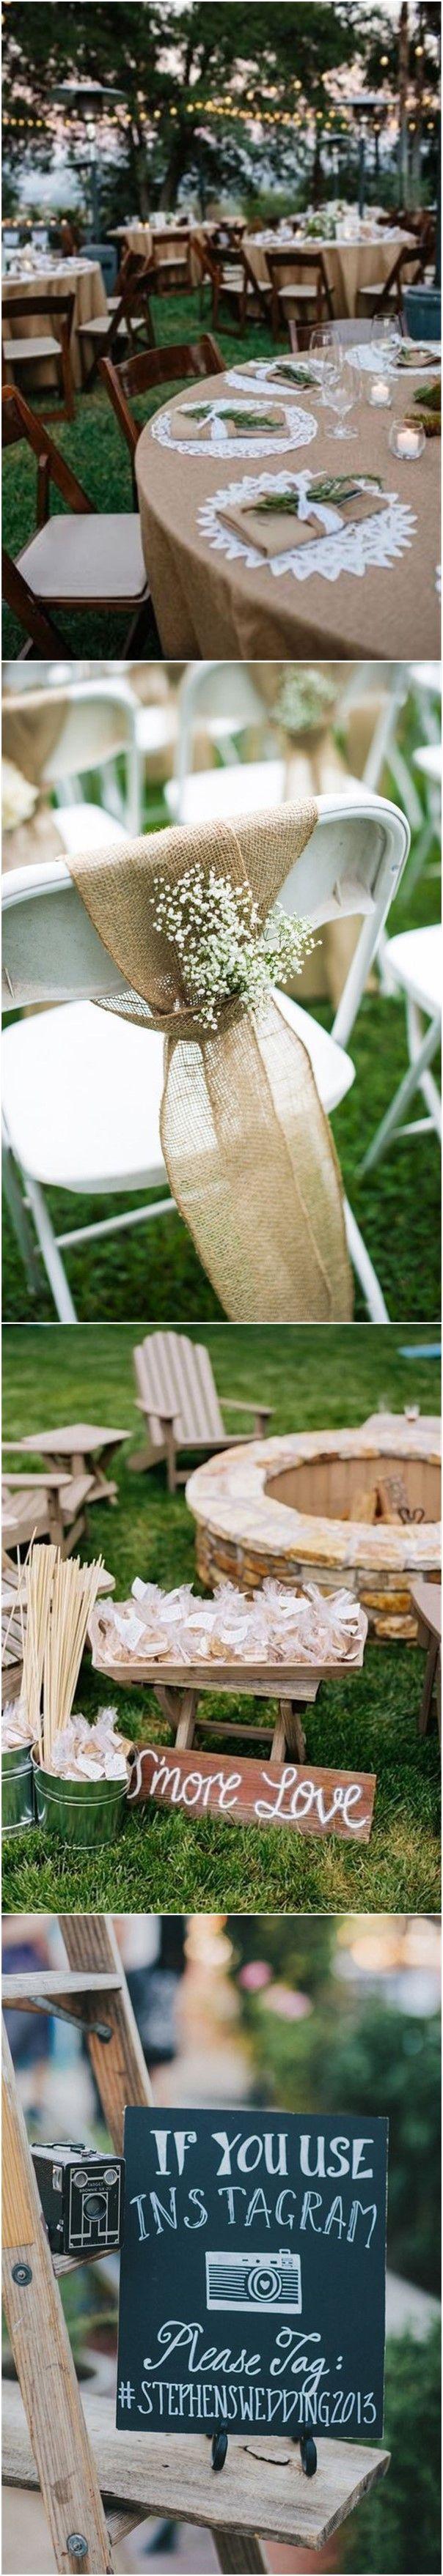 Wedding Decorations » 22 Rustic Backyard Wedding Decoration Ideas on A Budget » ❤️ More: http://www.weddinginclude.com/2017/08/rustic-backyard-wedding-decoration-ideas-on-a-budget/